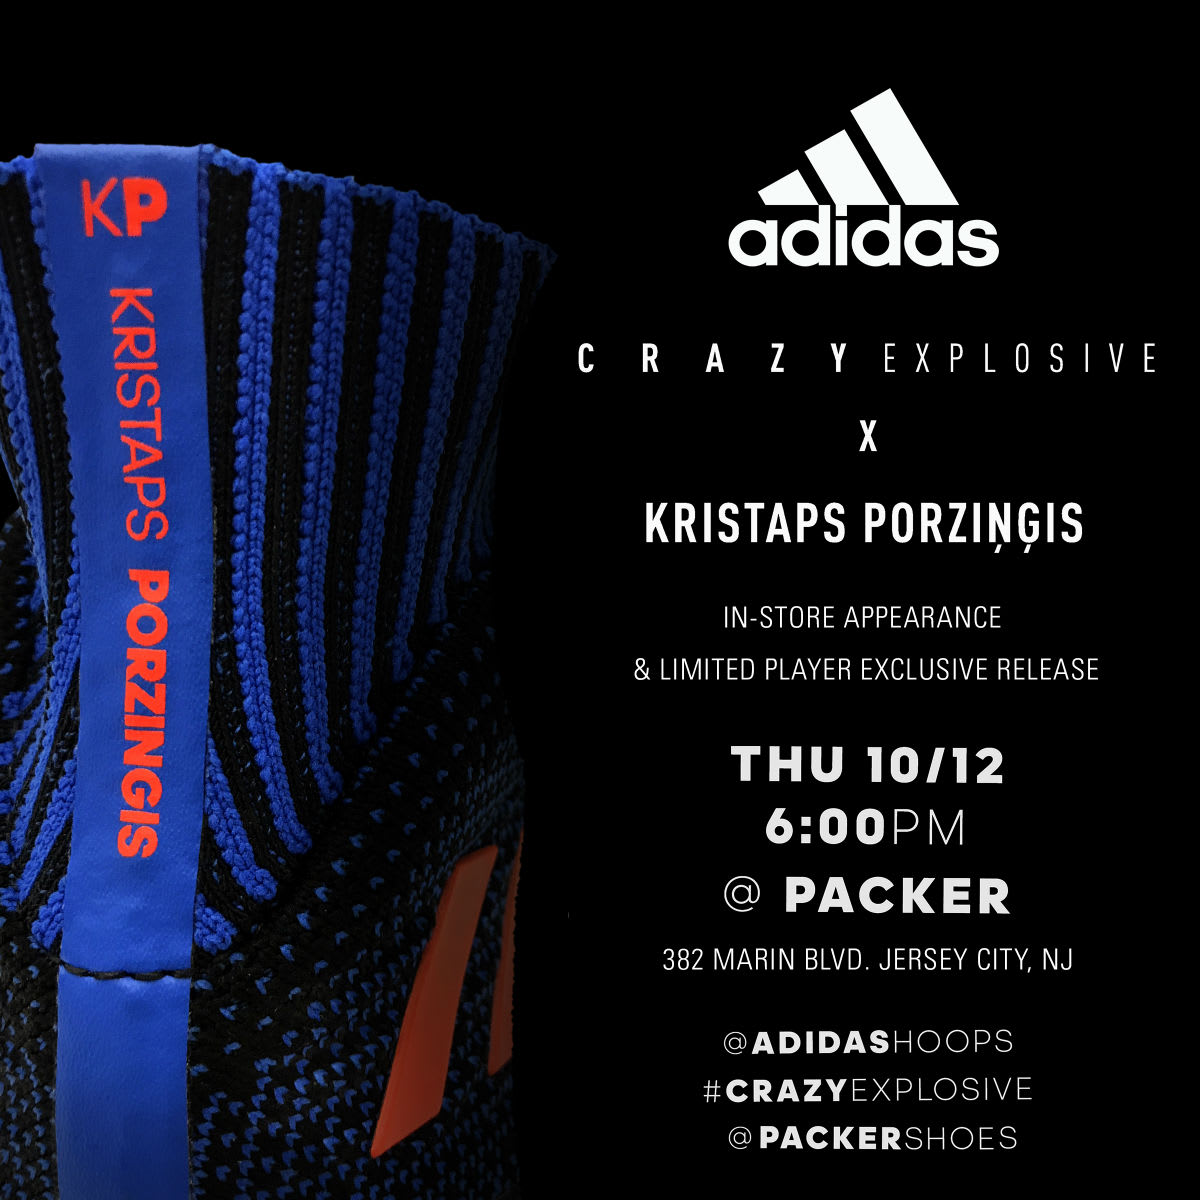 Adidas Crazy Explosive Kristaps Porzingis PE Release Date